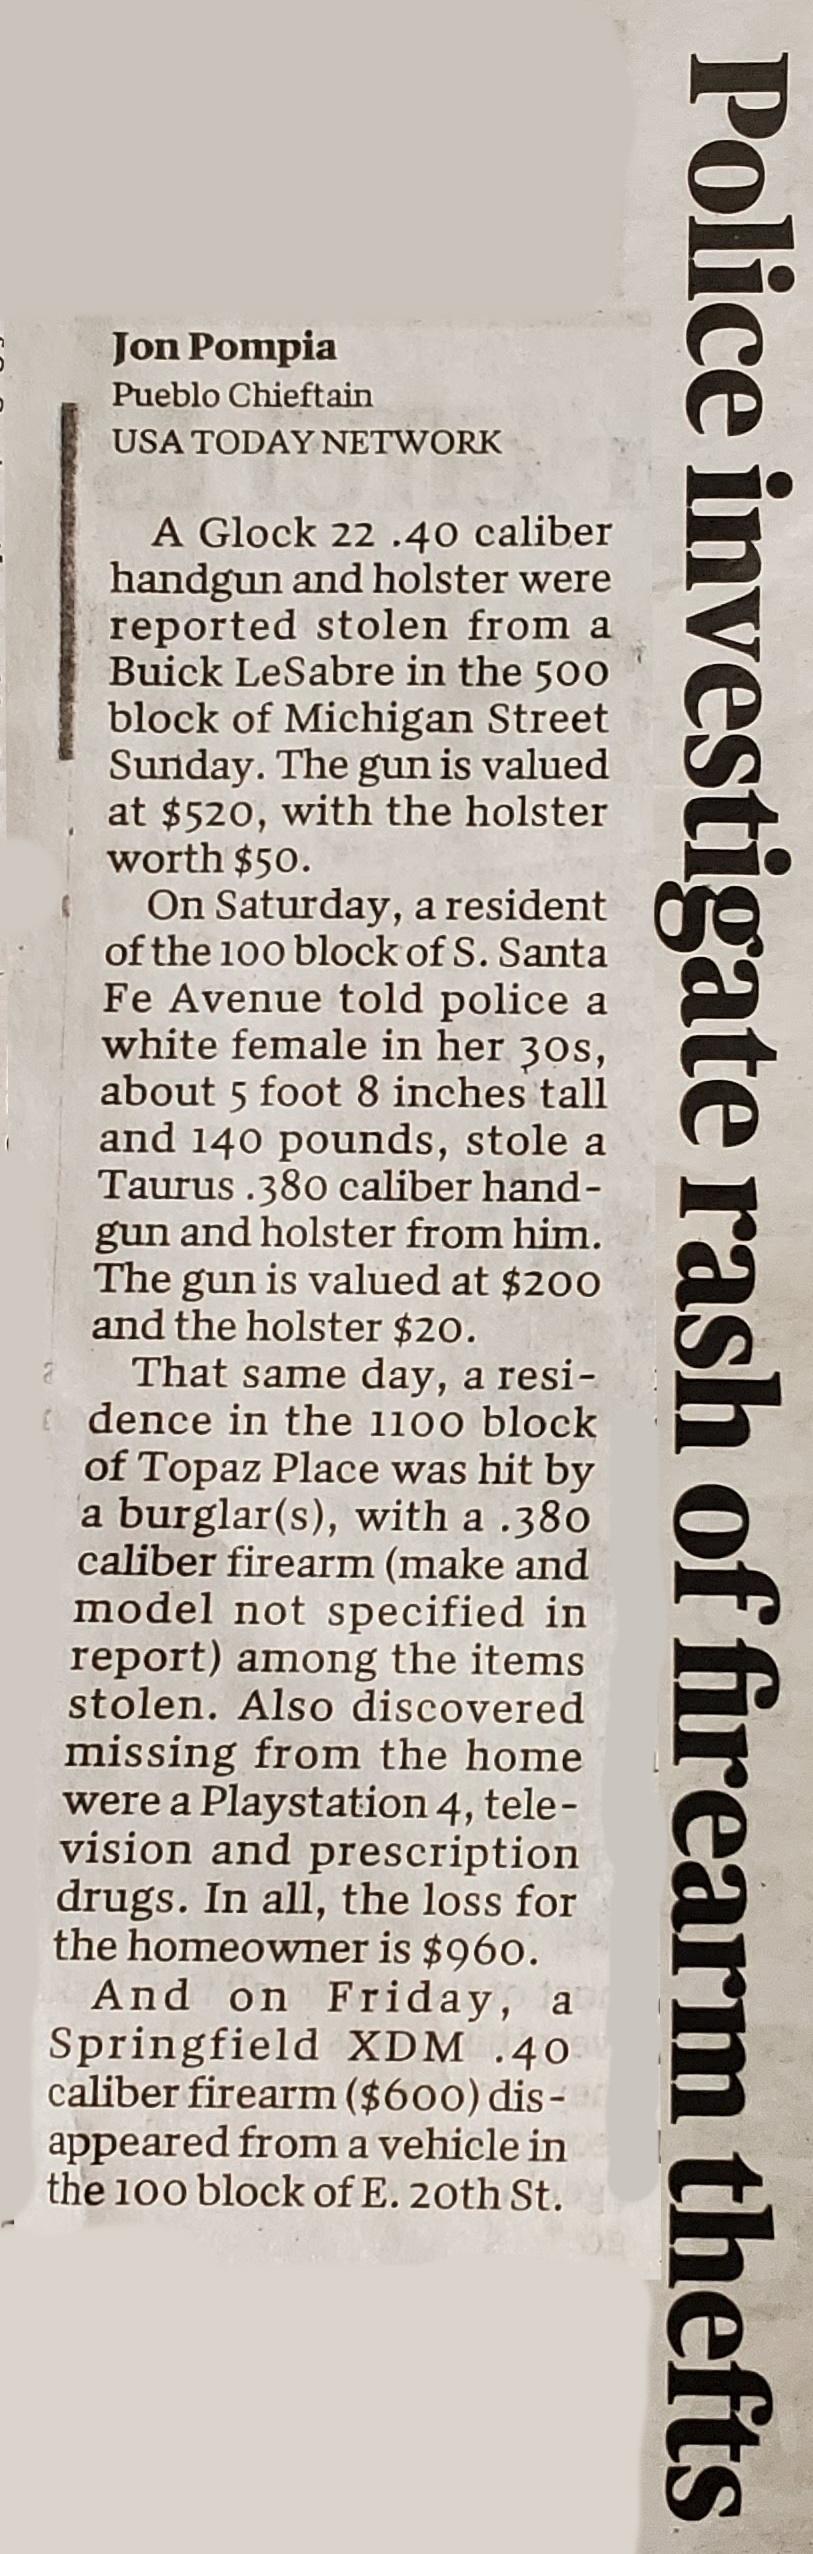 firearms theft